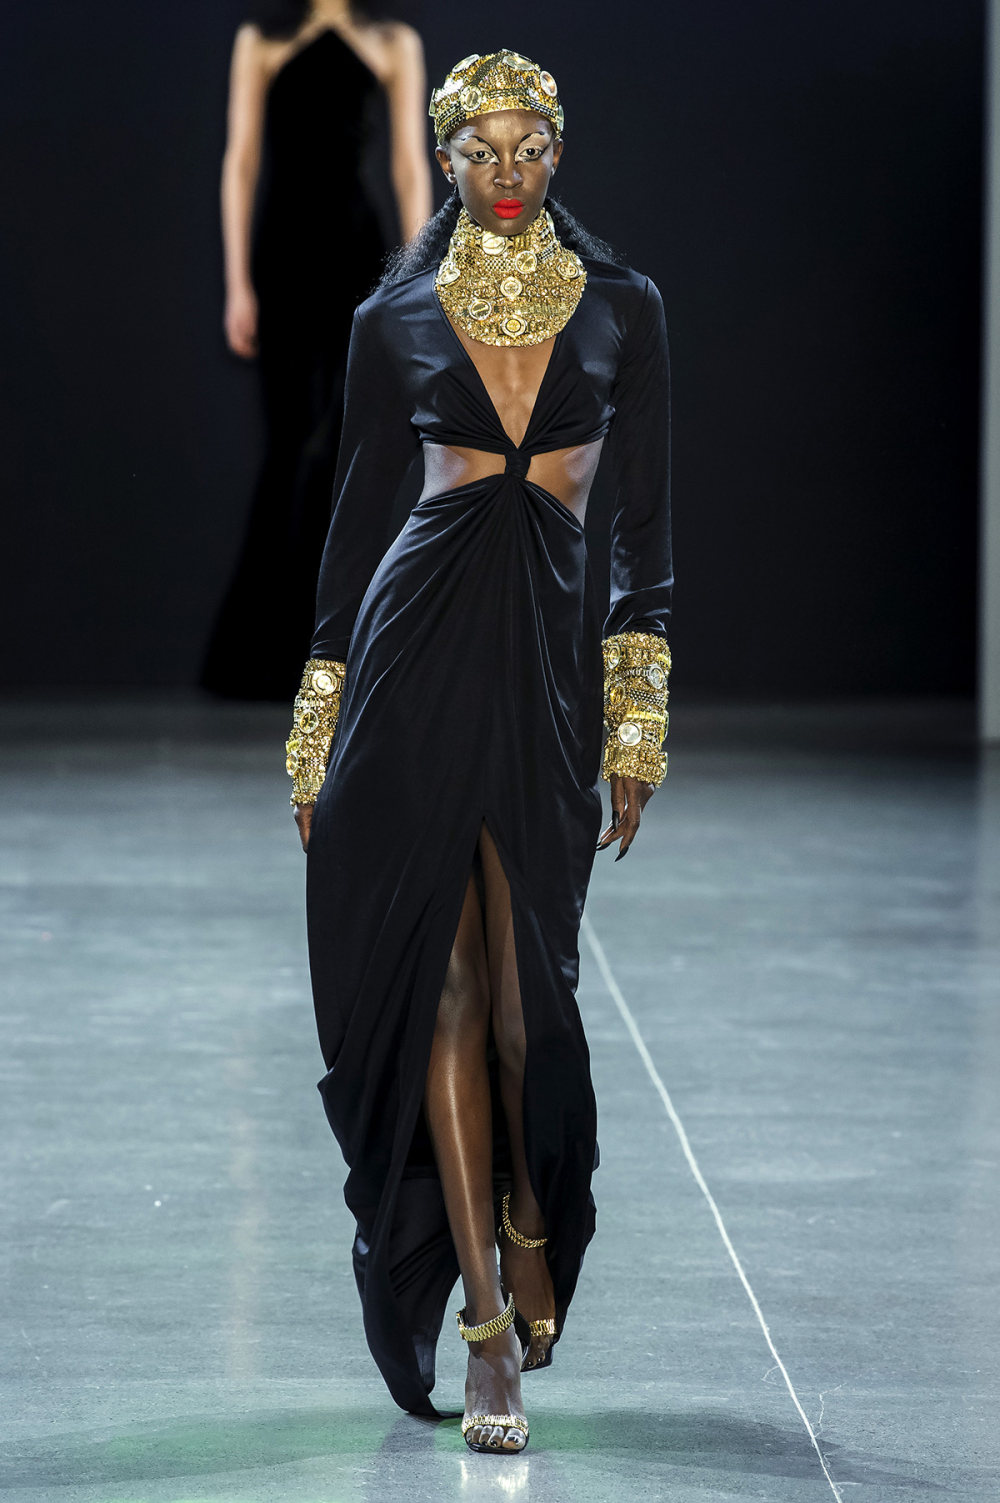 Christian Cowan时装系列虽然巨大的薄纱层状服装并没有那么特别-31.jpg